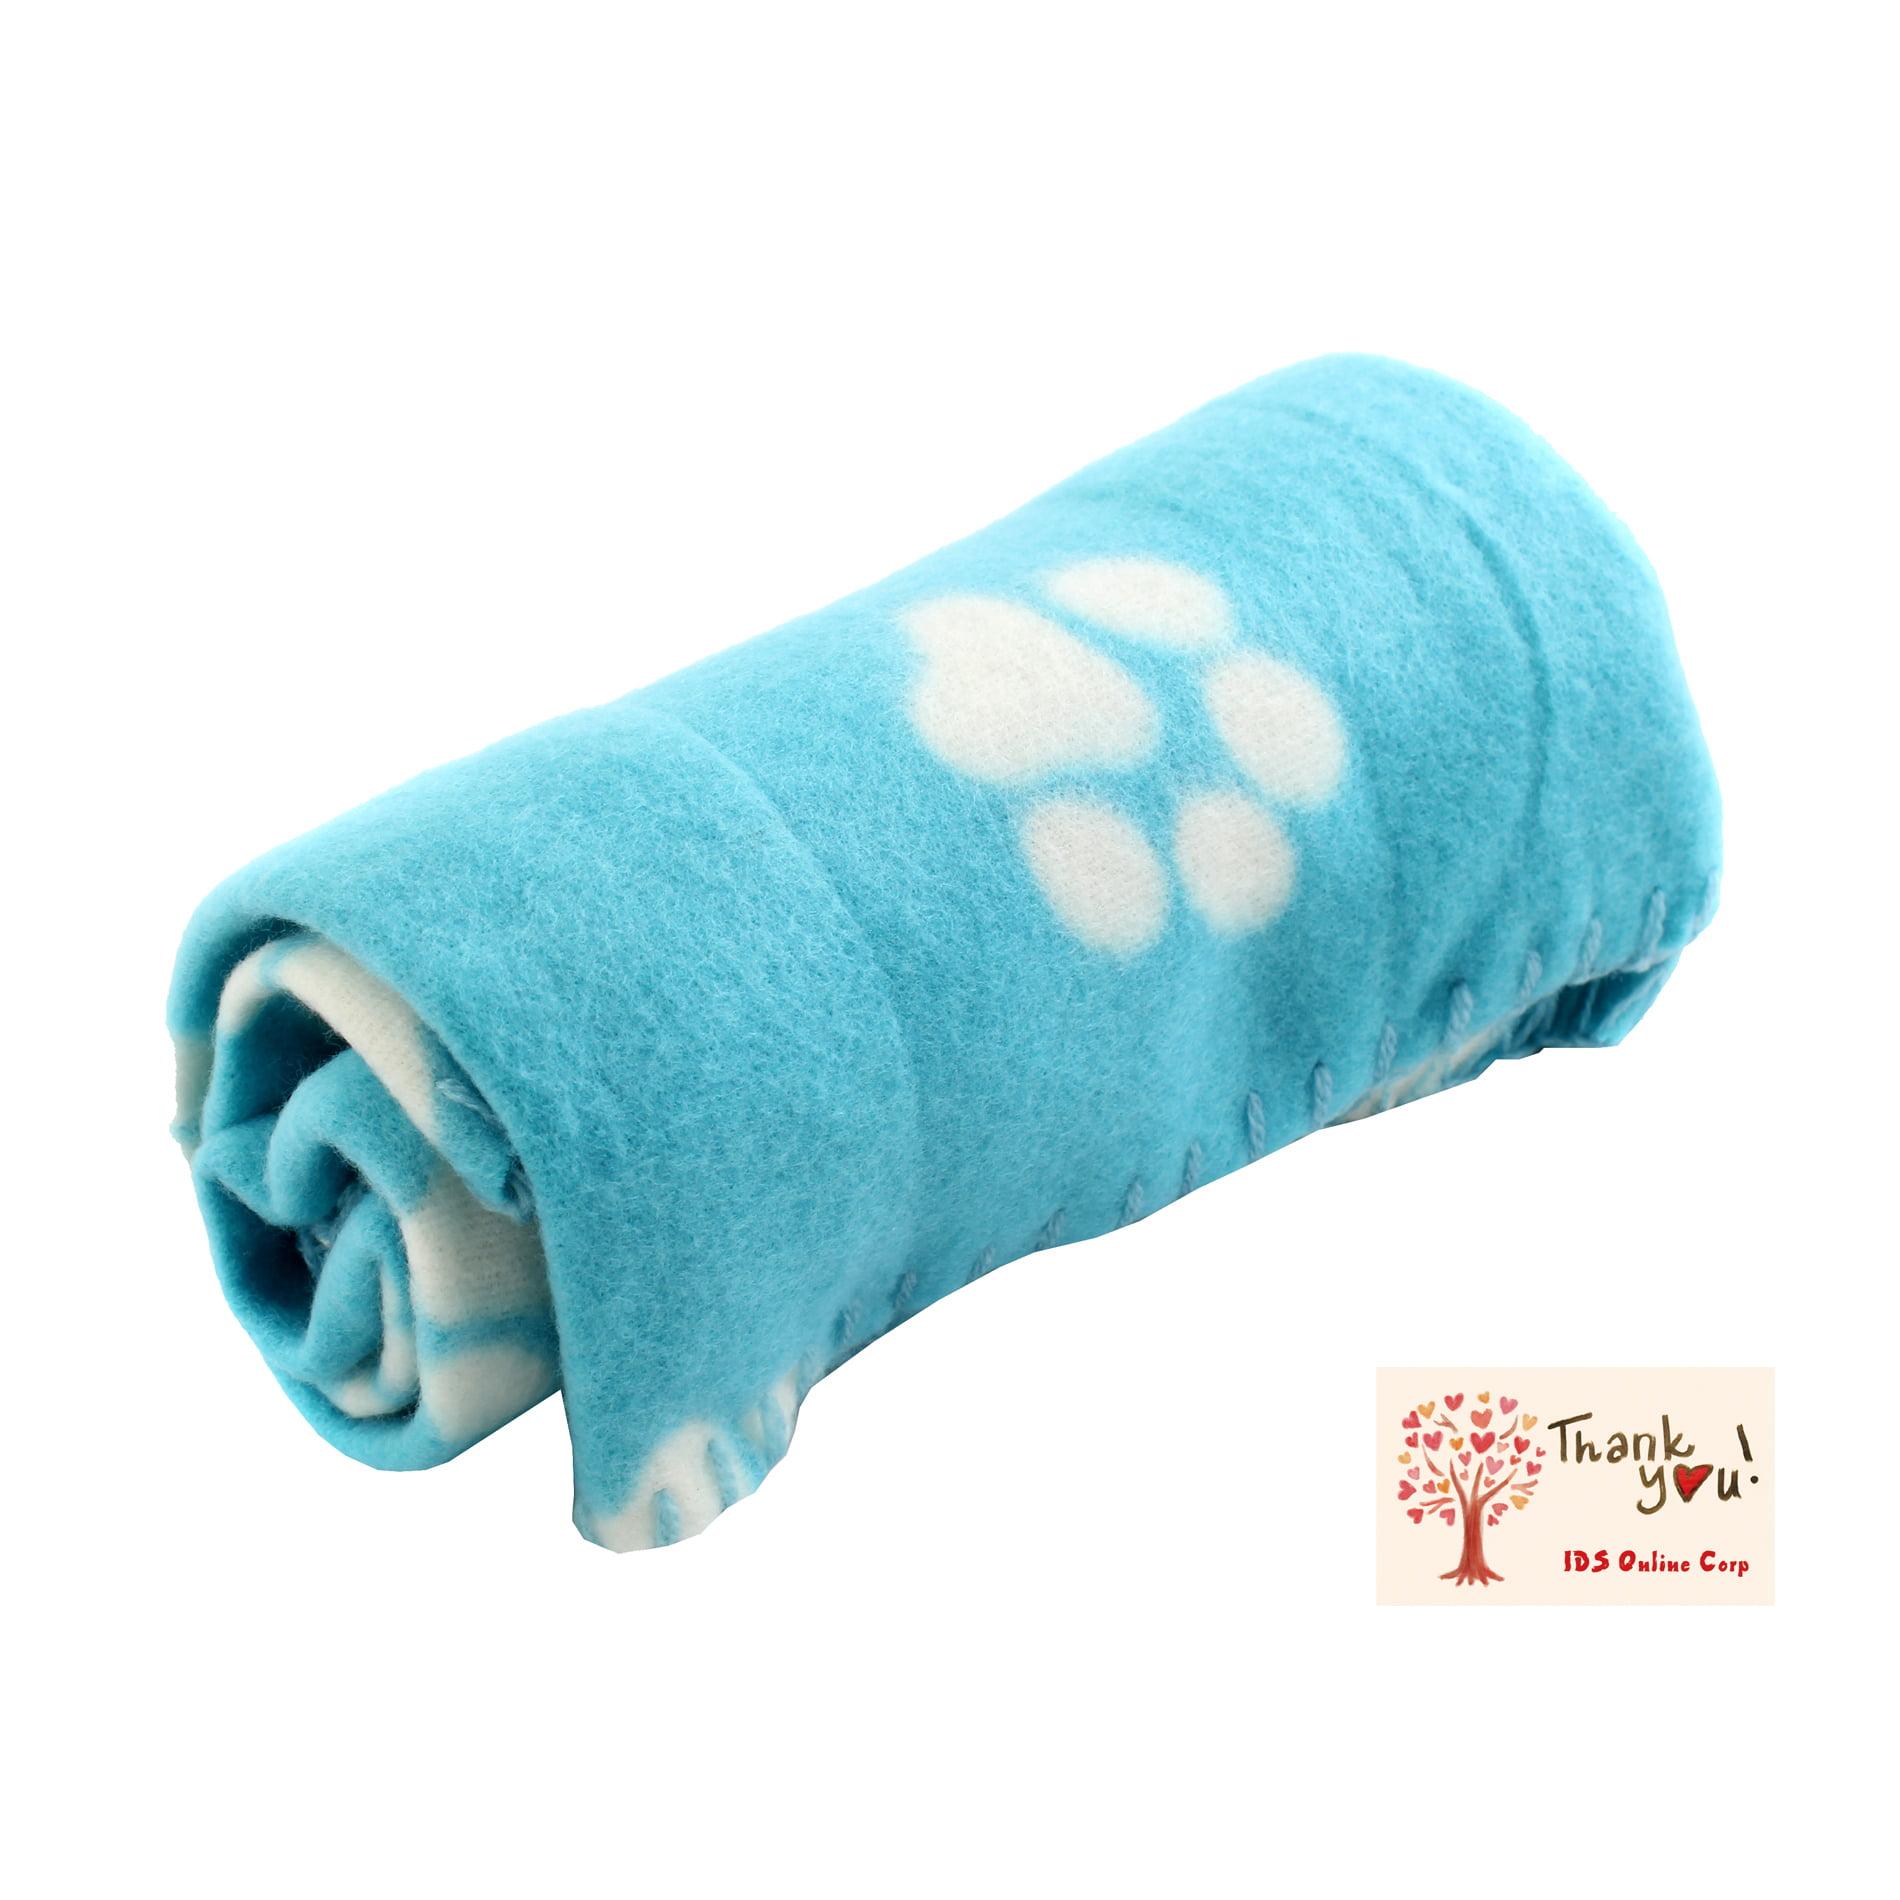 Soft Fleece Pet Dog Cat Puppy Kitten Warm Blanket Sleep Bed Mat with Paw Print